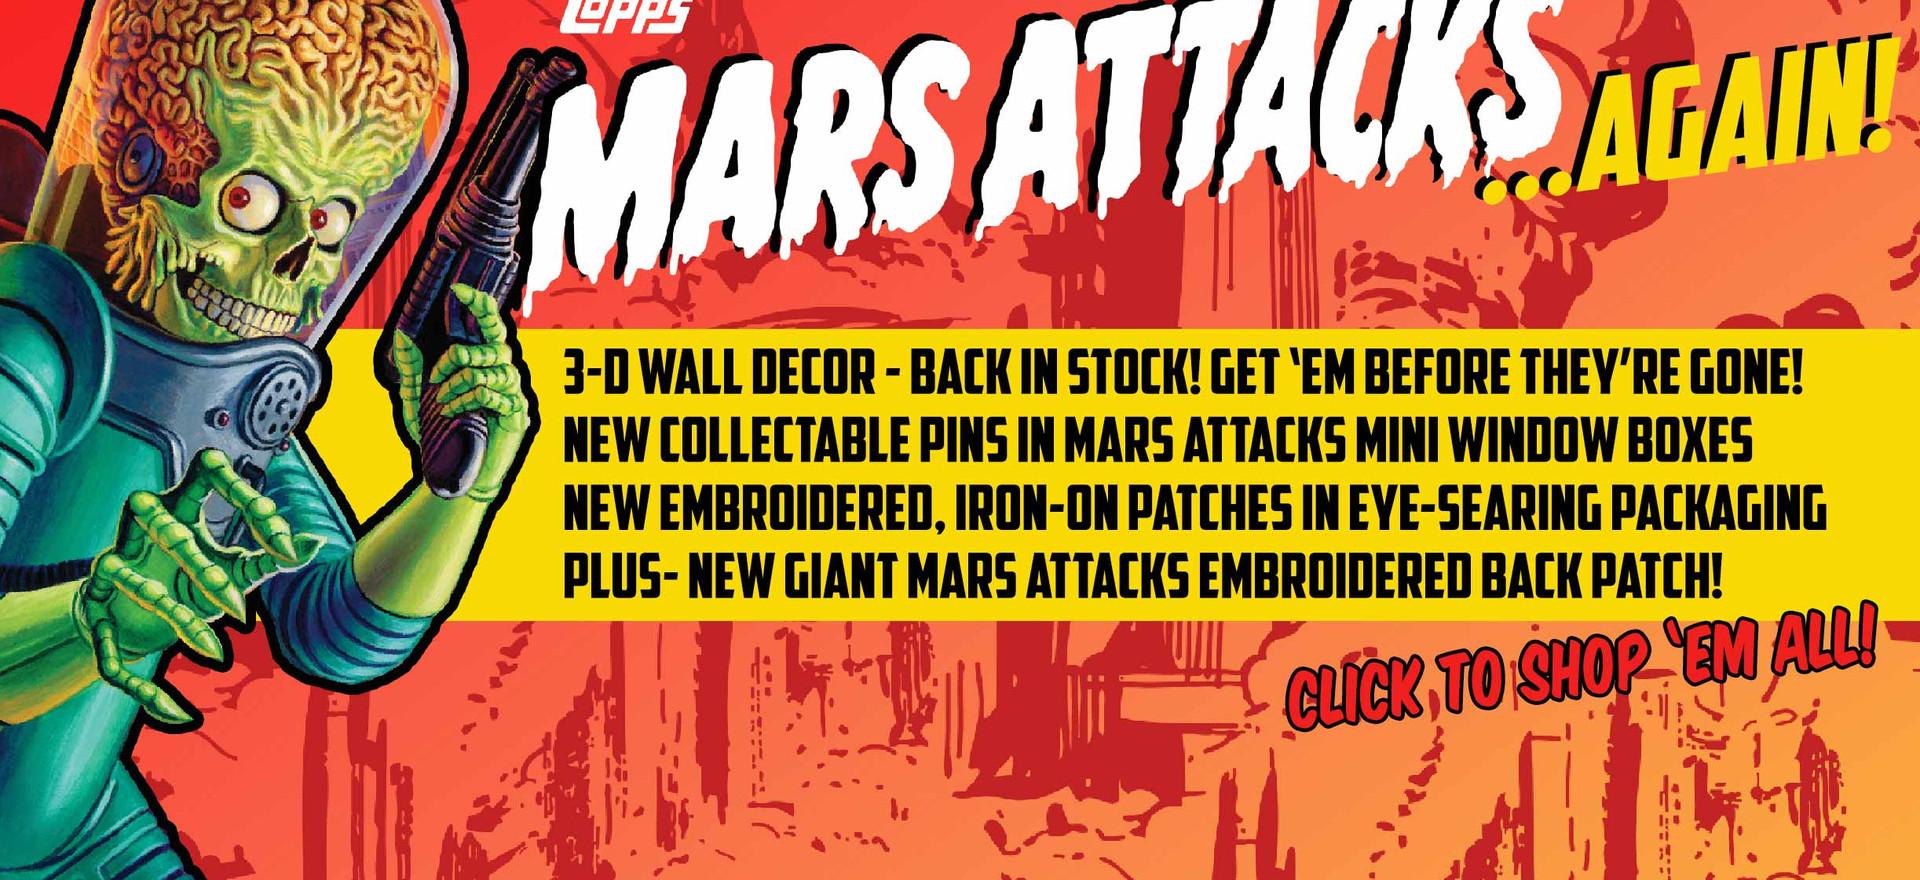 mars_attacks_billboard_8.1.2019-optimize